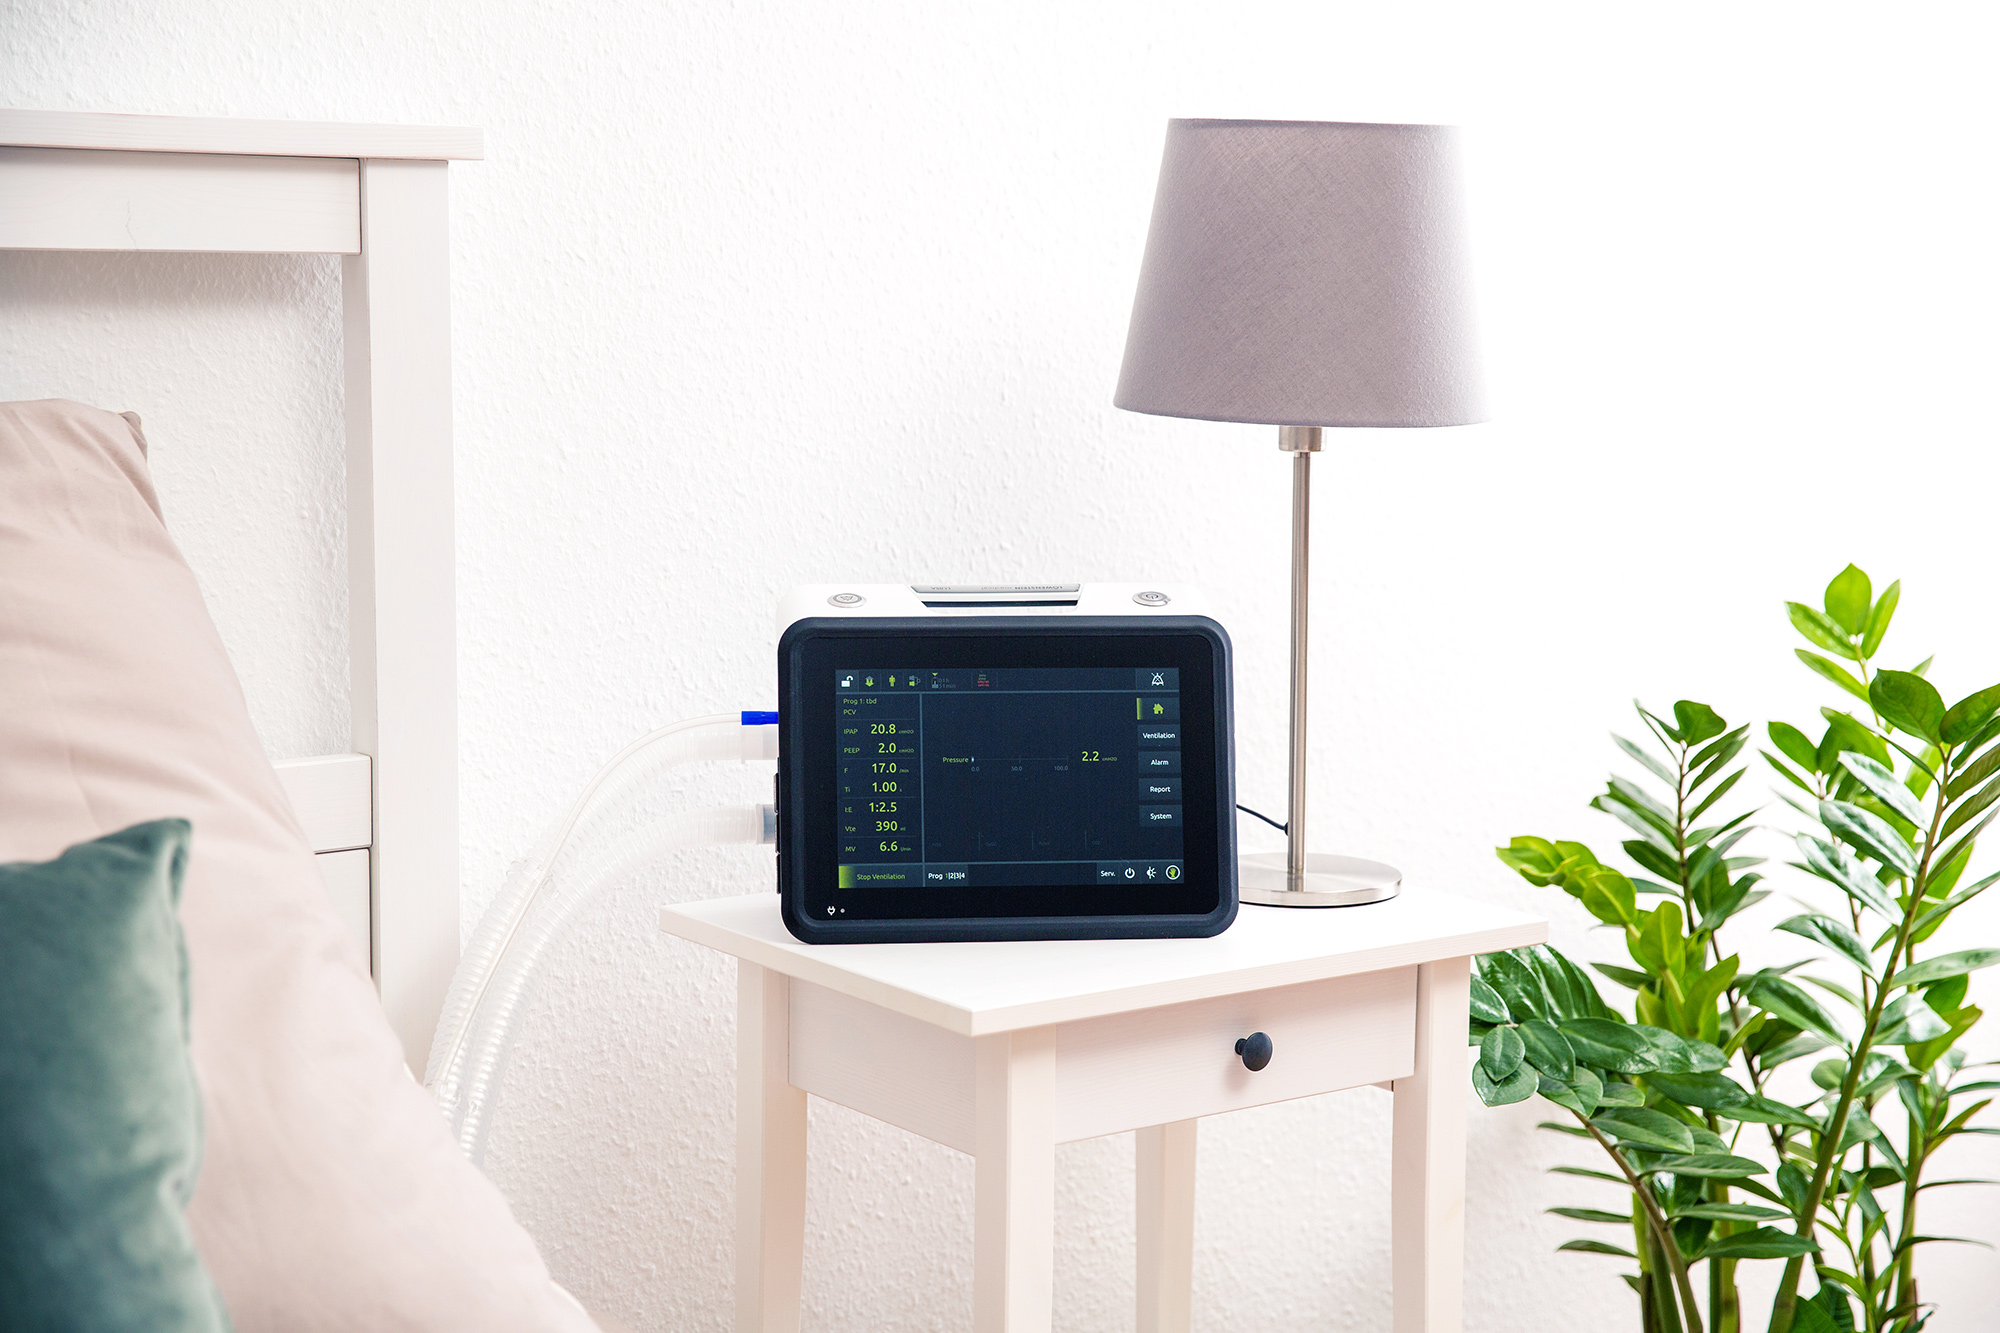 Аппарат ИВЛ LUISA стоит на столе у кровати, подключен контур пациента.